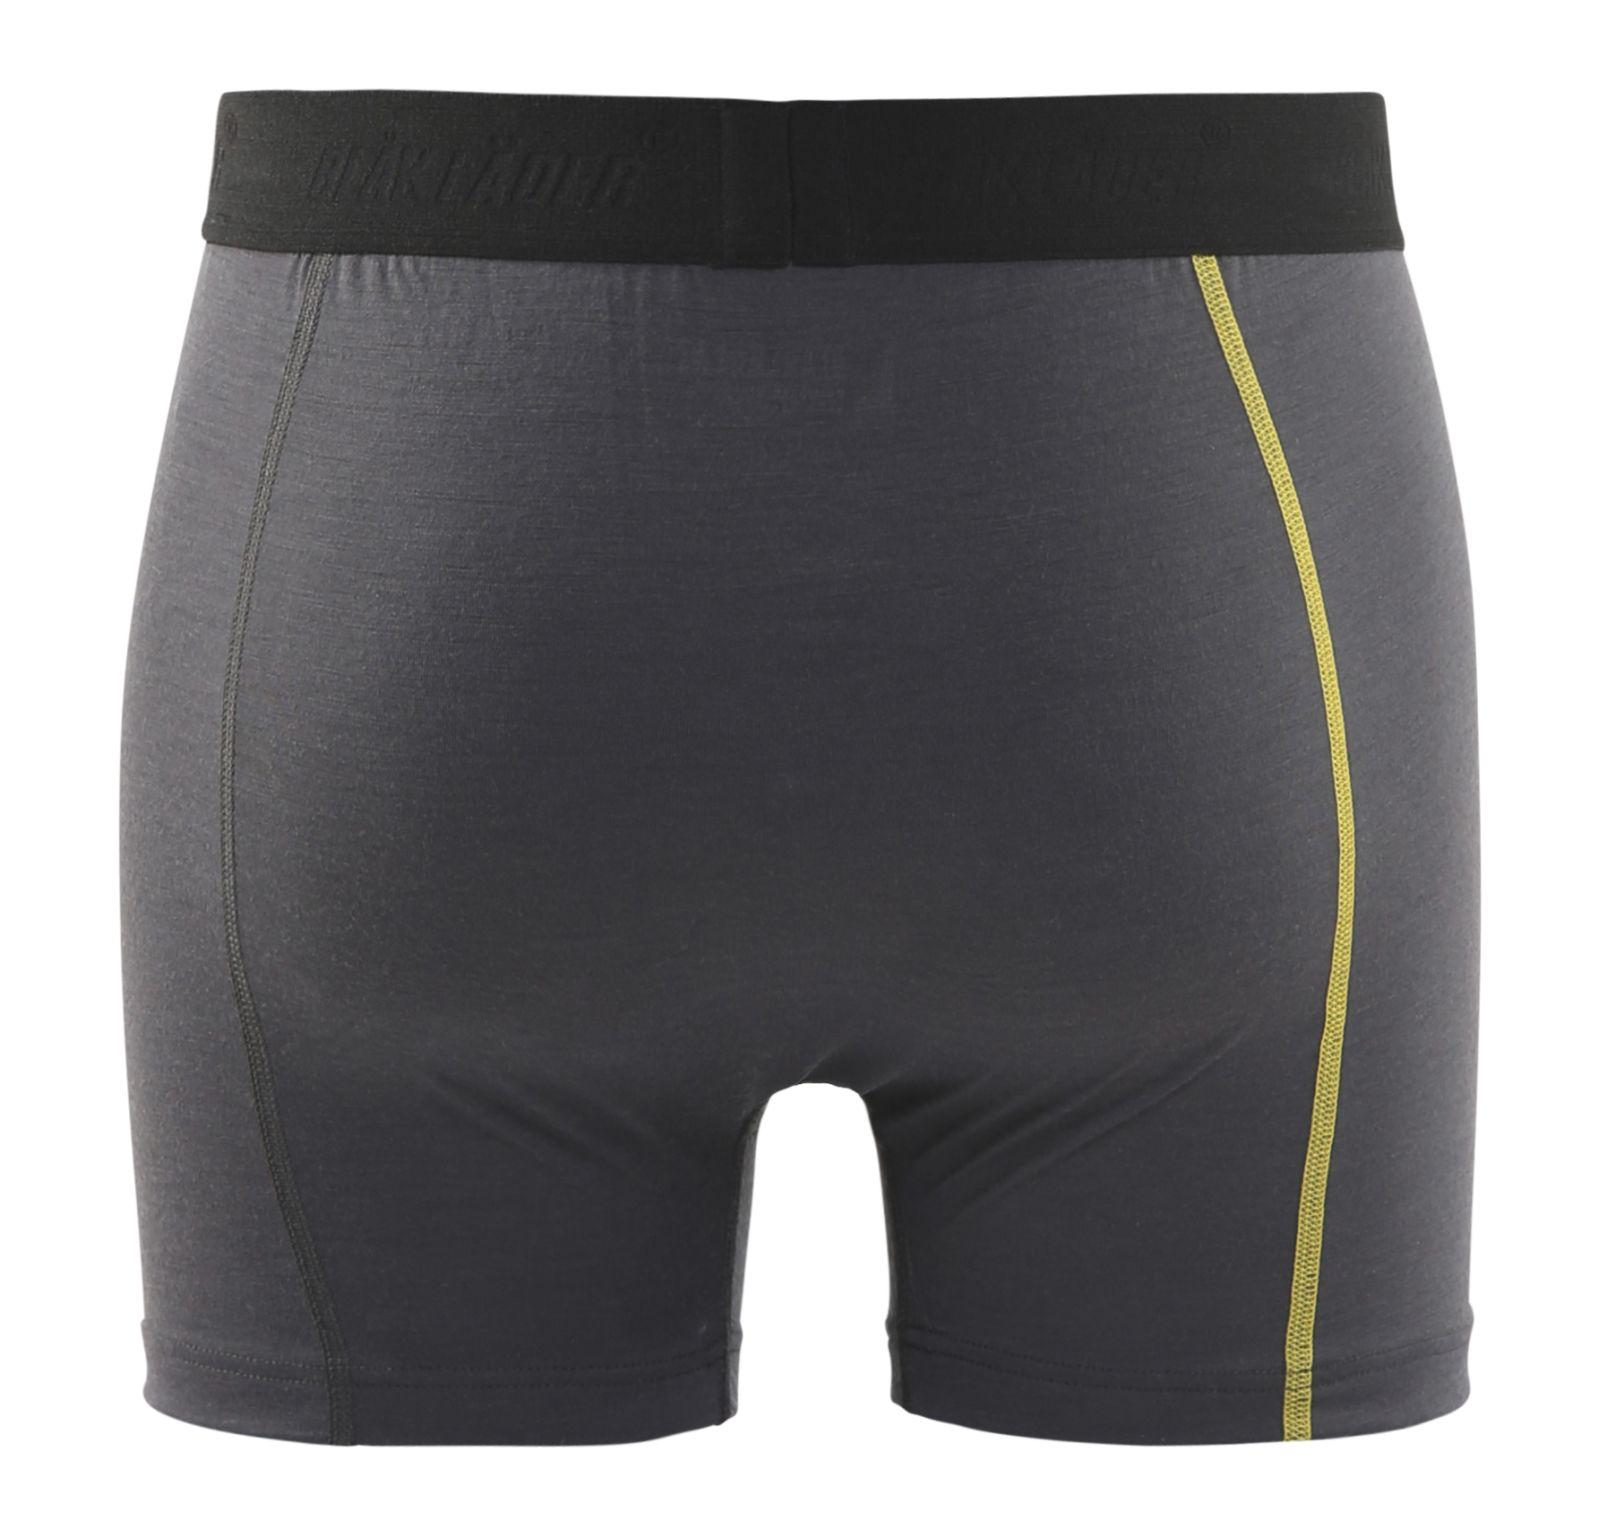 Blaklader Boxershorts 18471734 donkergrijs-geel(9835)